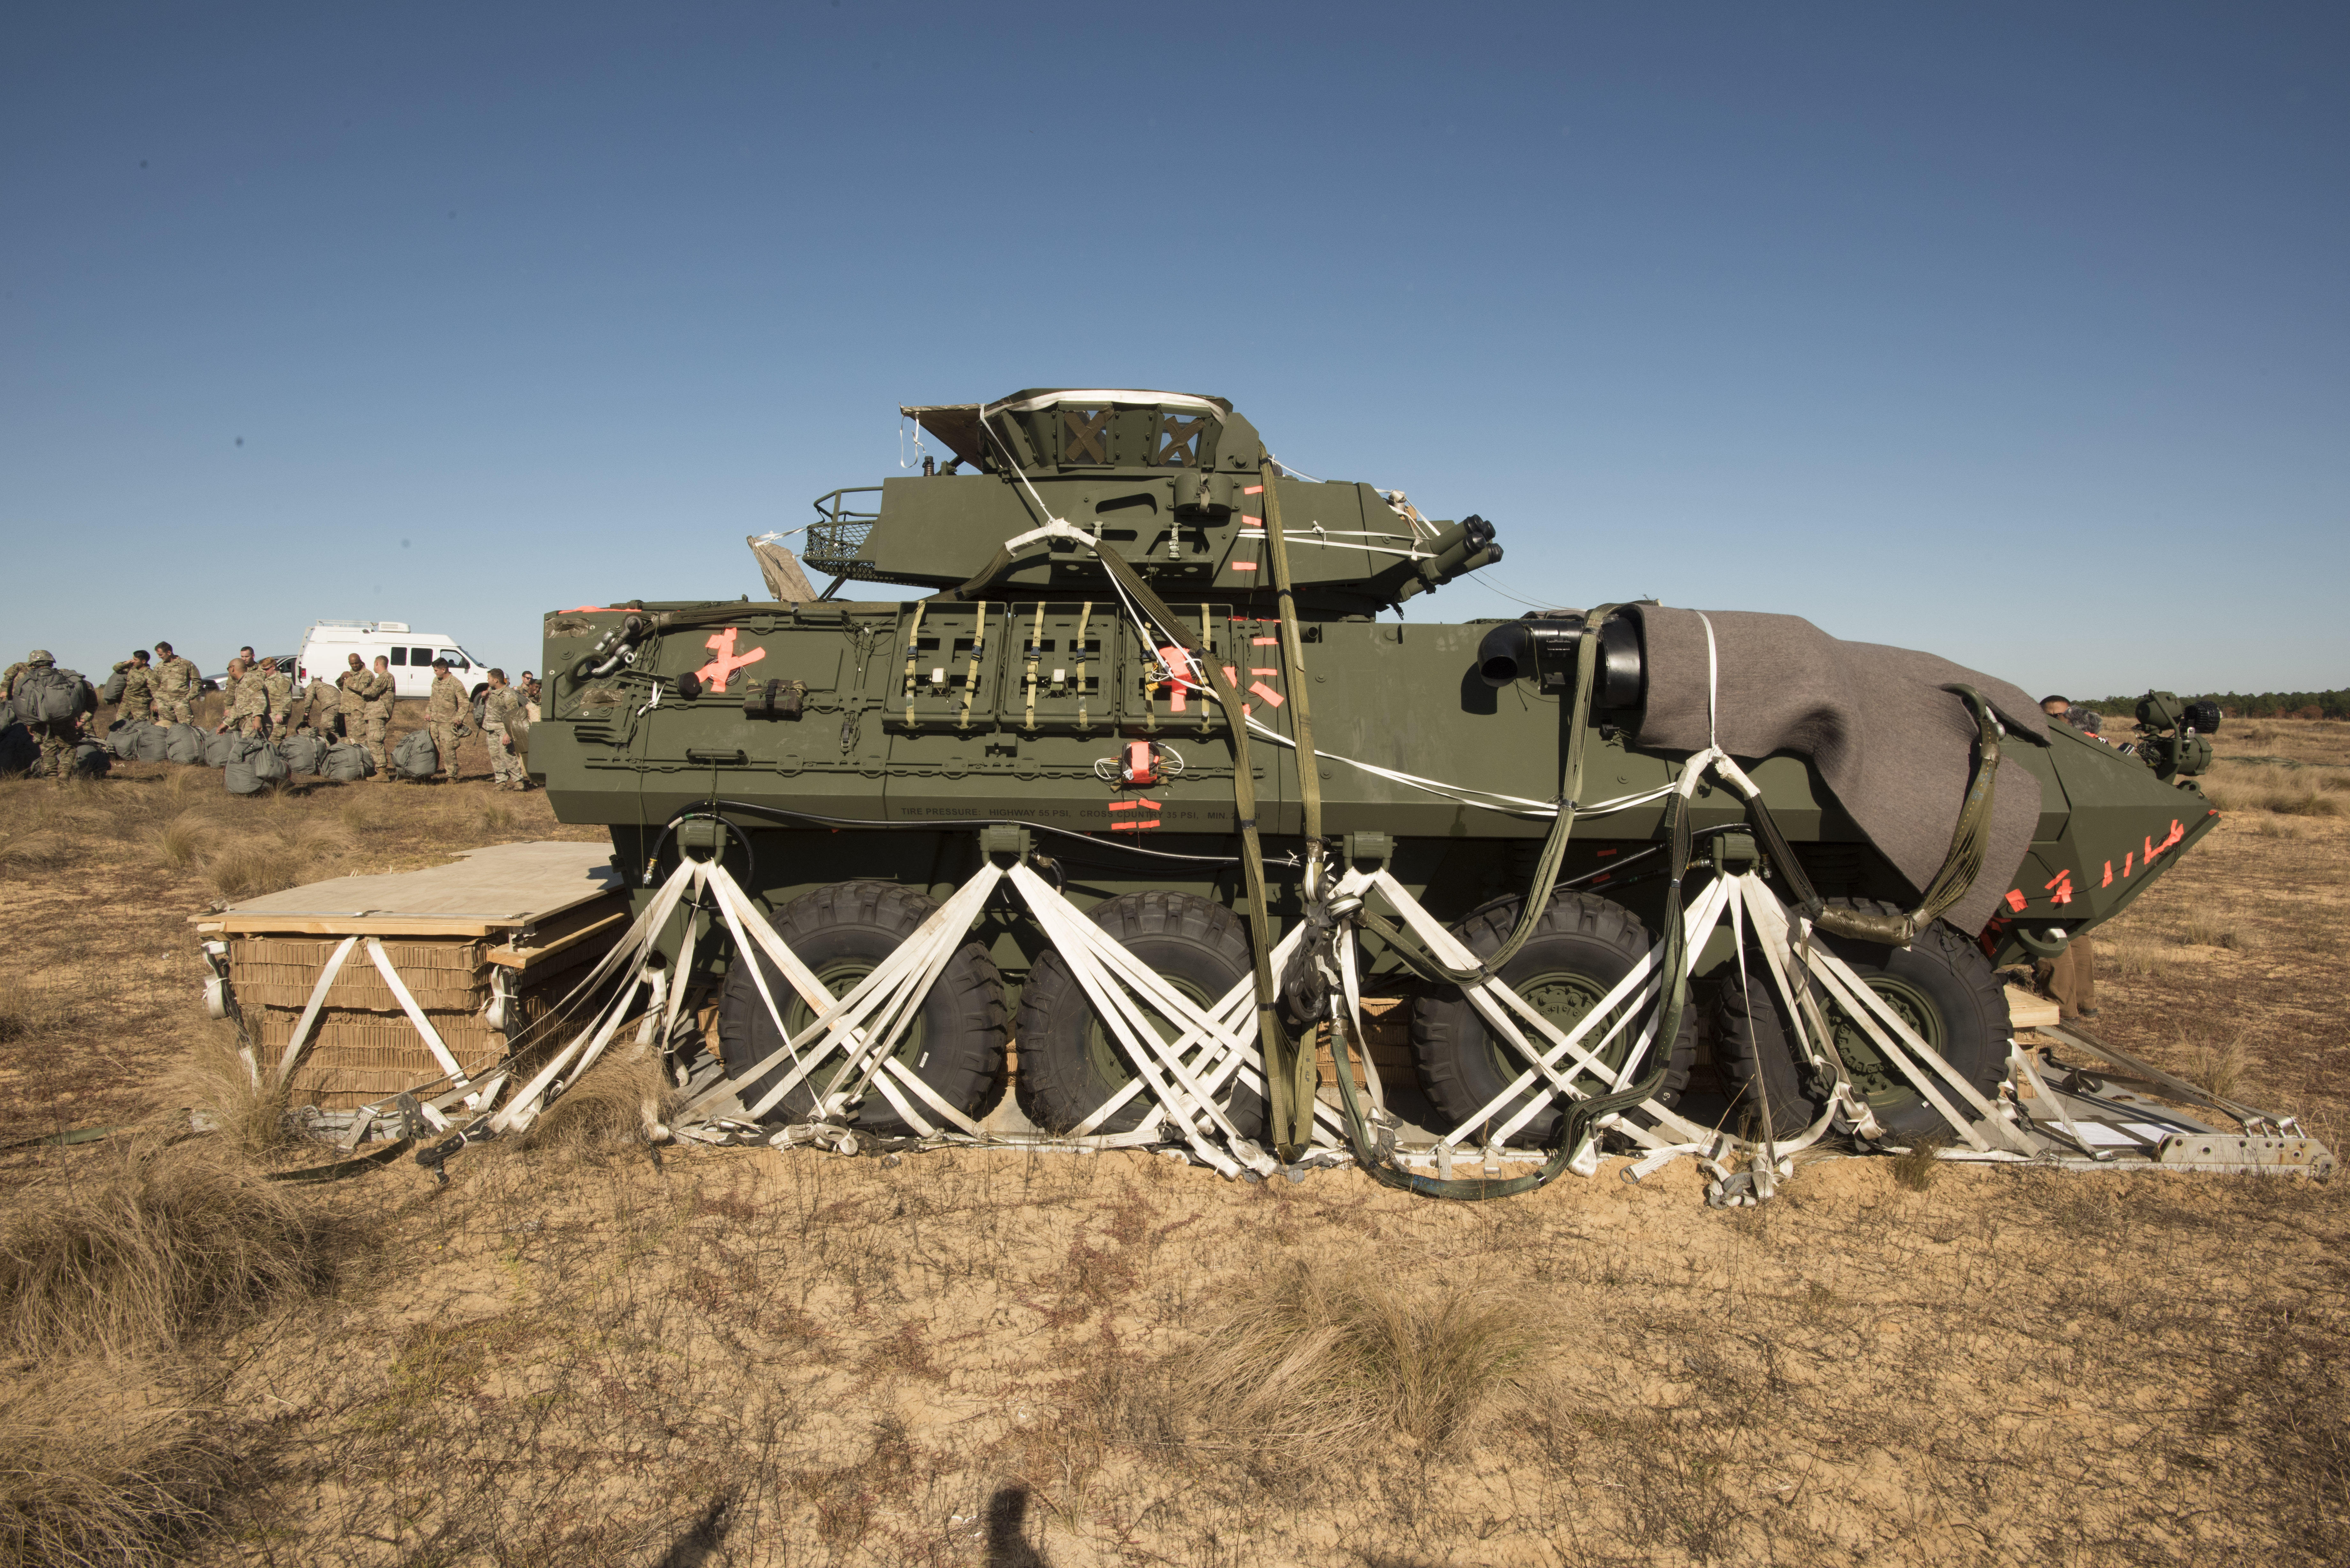 82nd Airborne Division's 3rd Brigade Combat Team airdrop tests Light